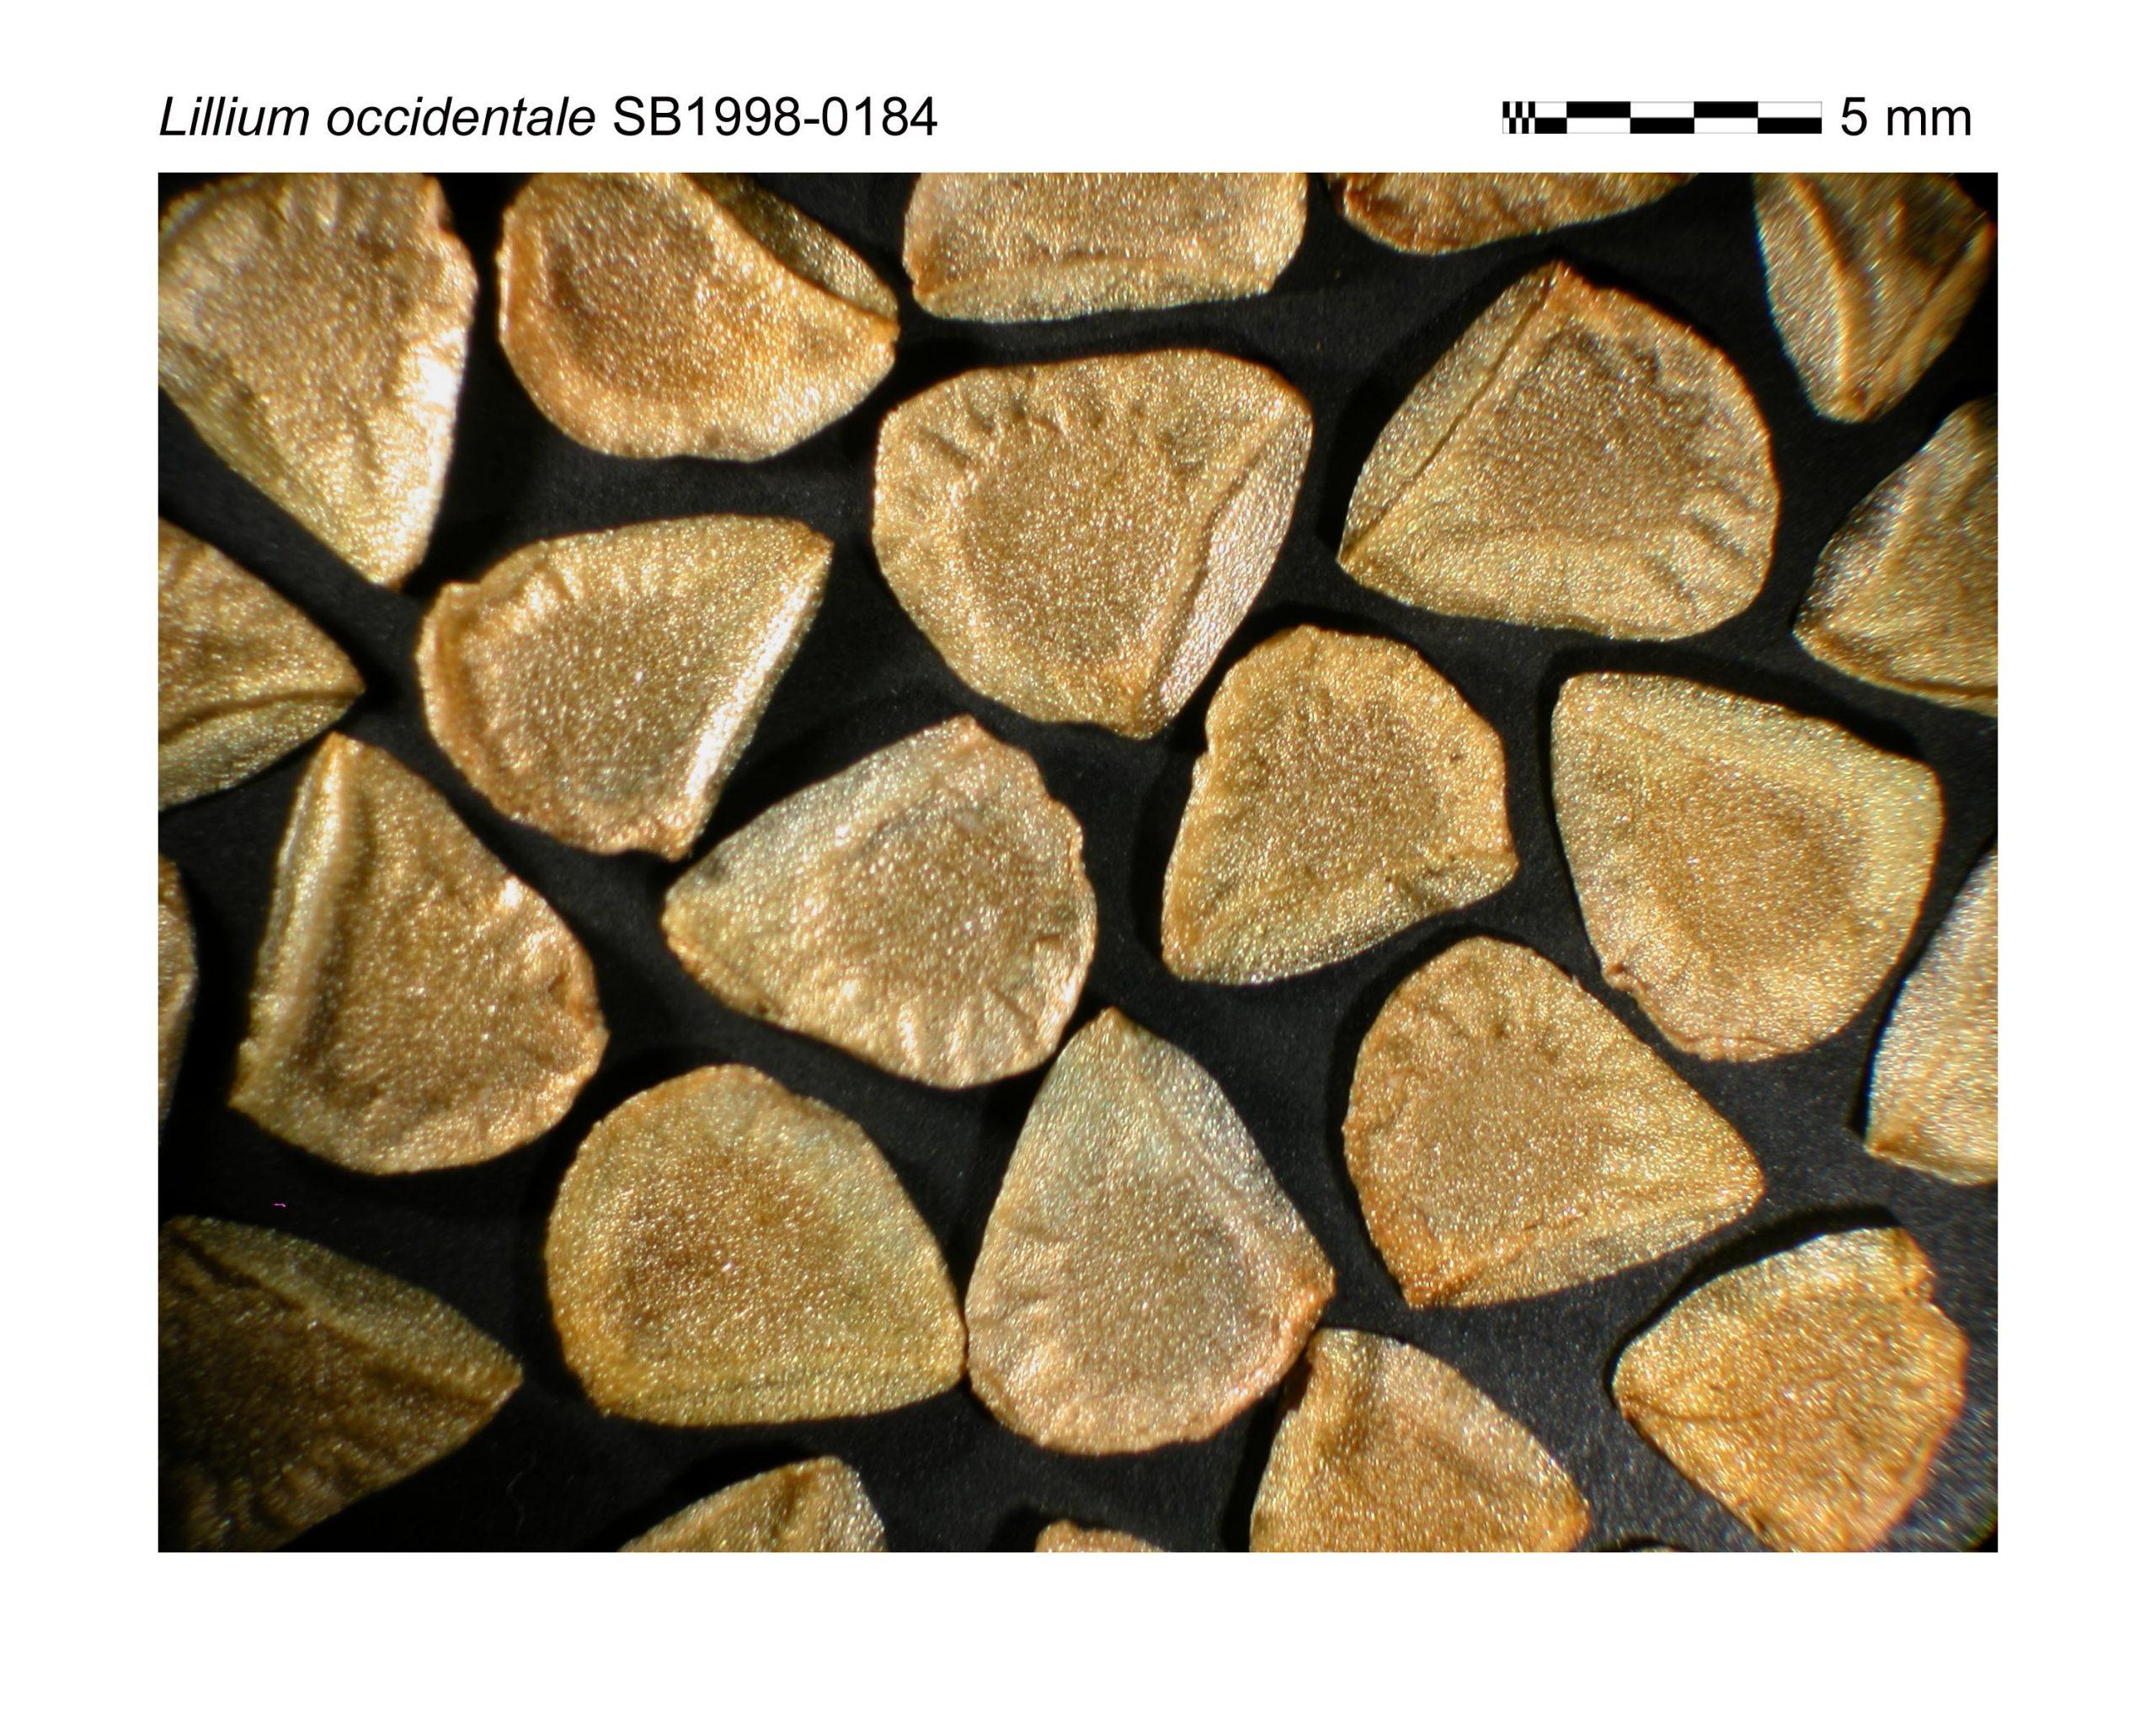 Lillium occidentale seeds